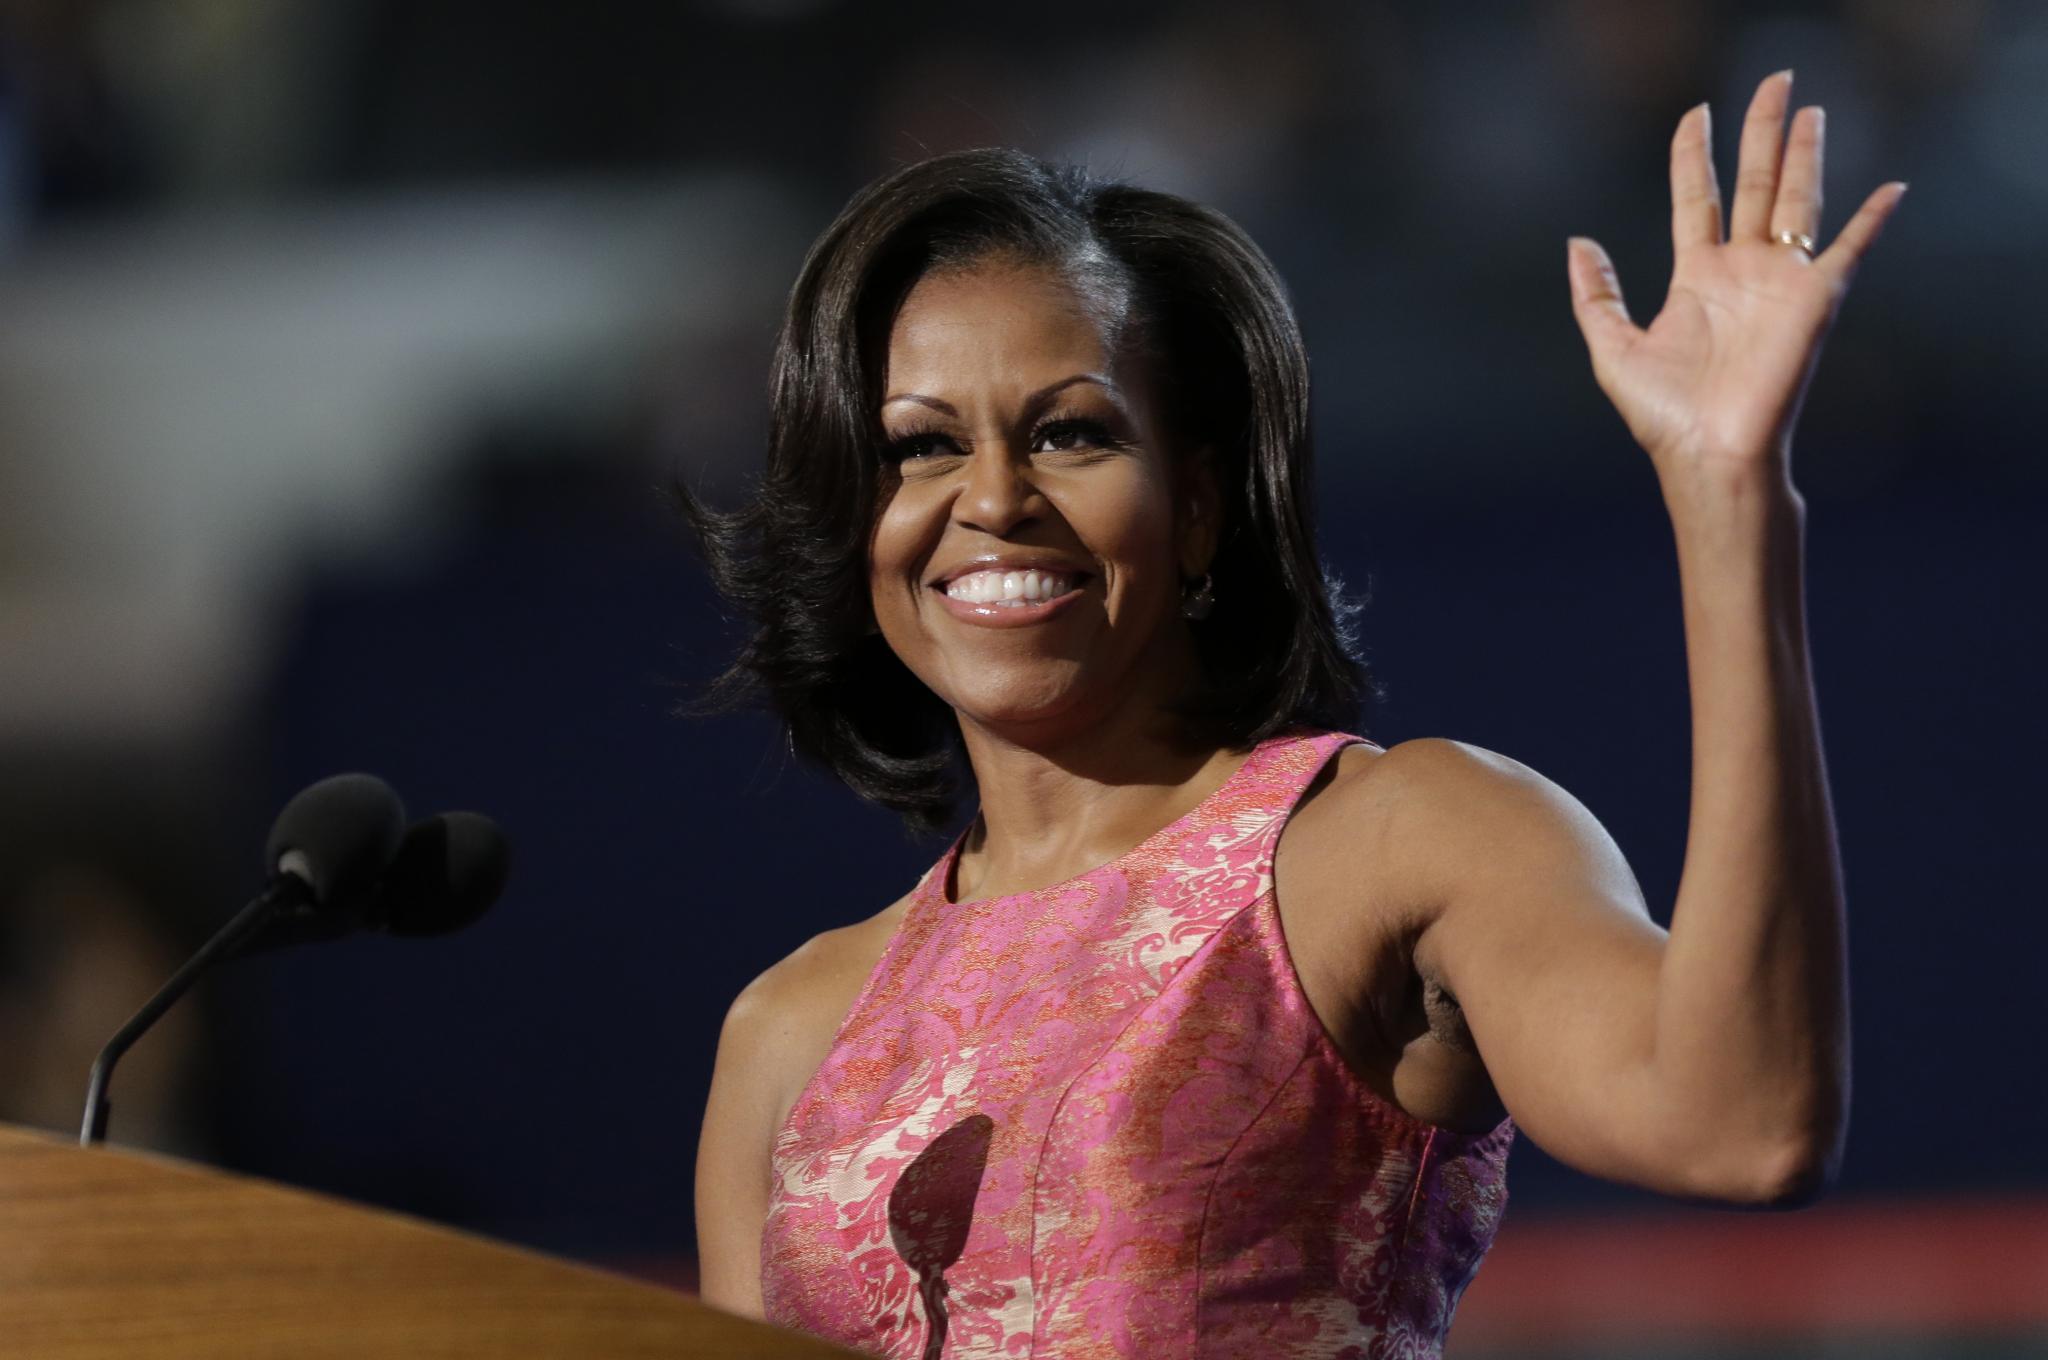 Must-See: Watch Michelle Obama's Inspiring DNC Speech